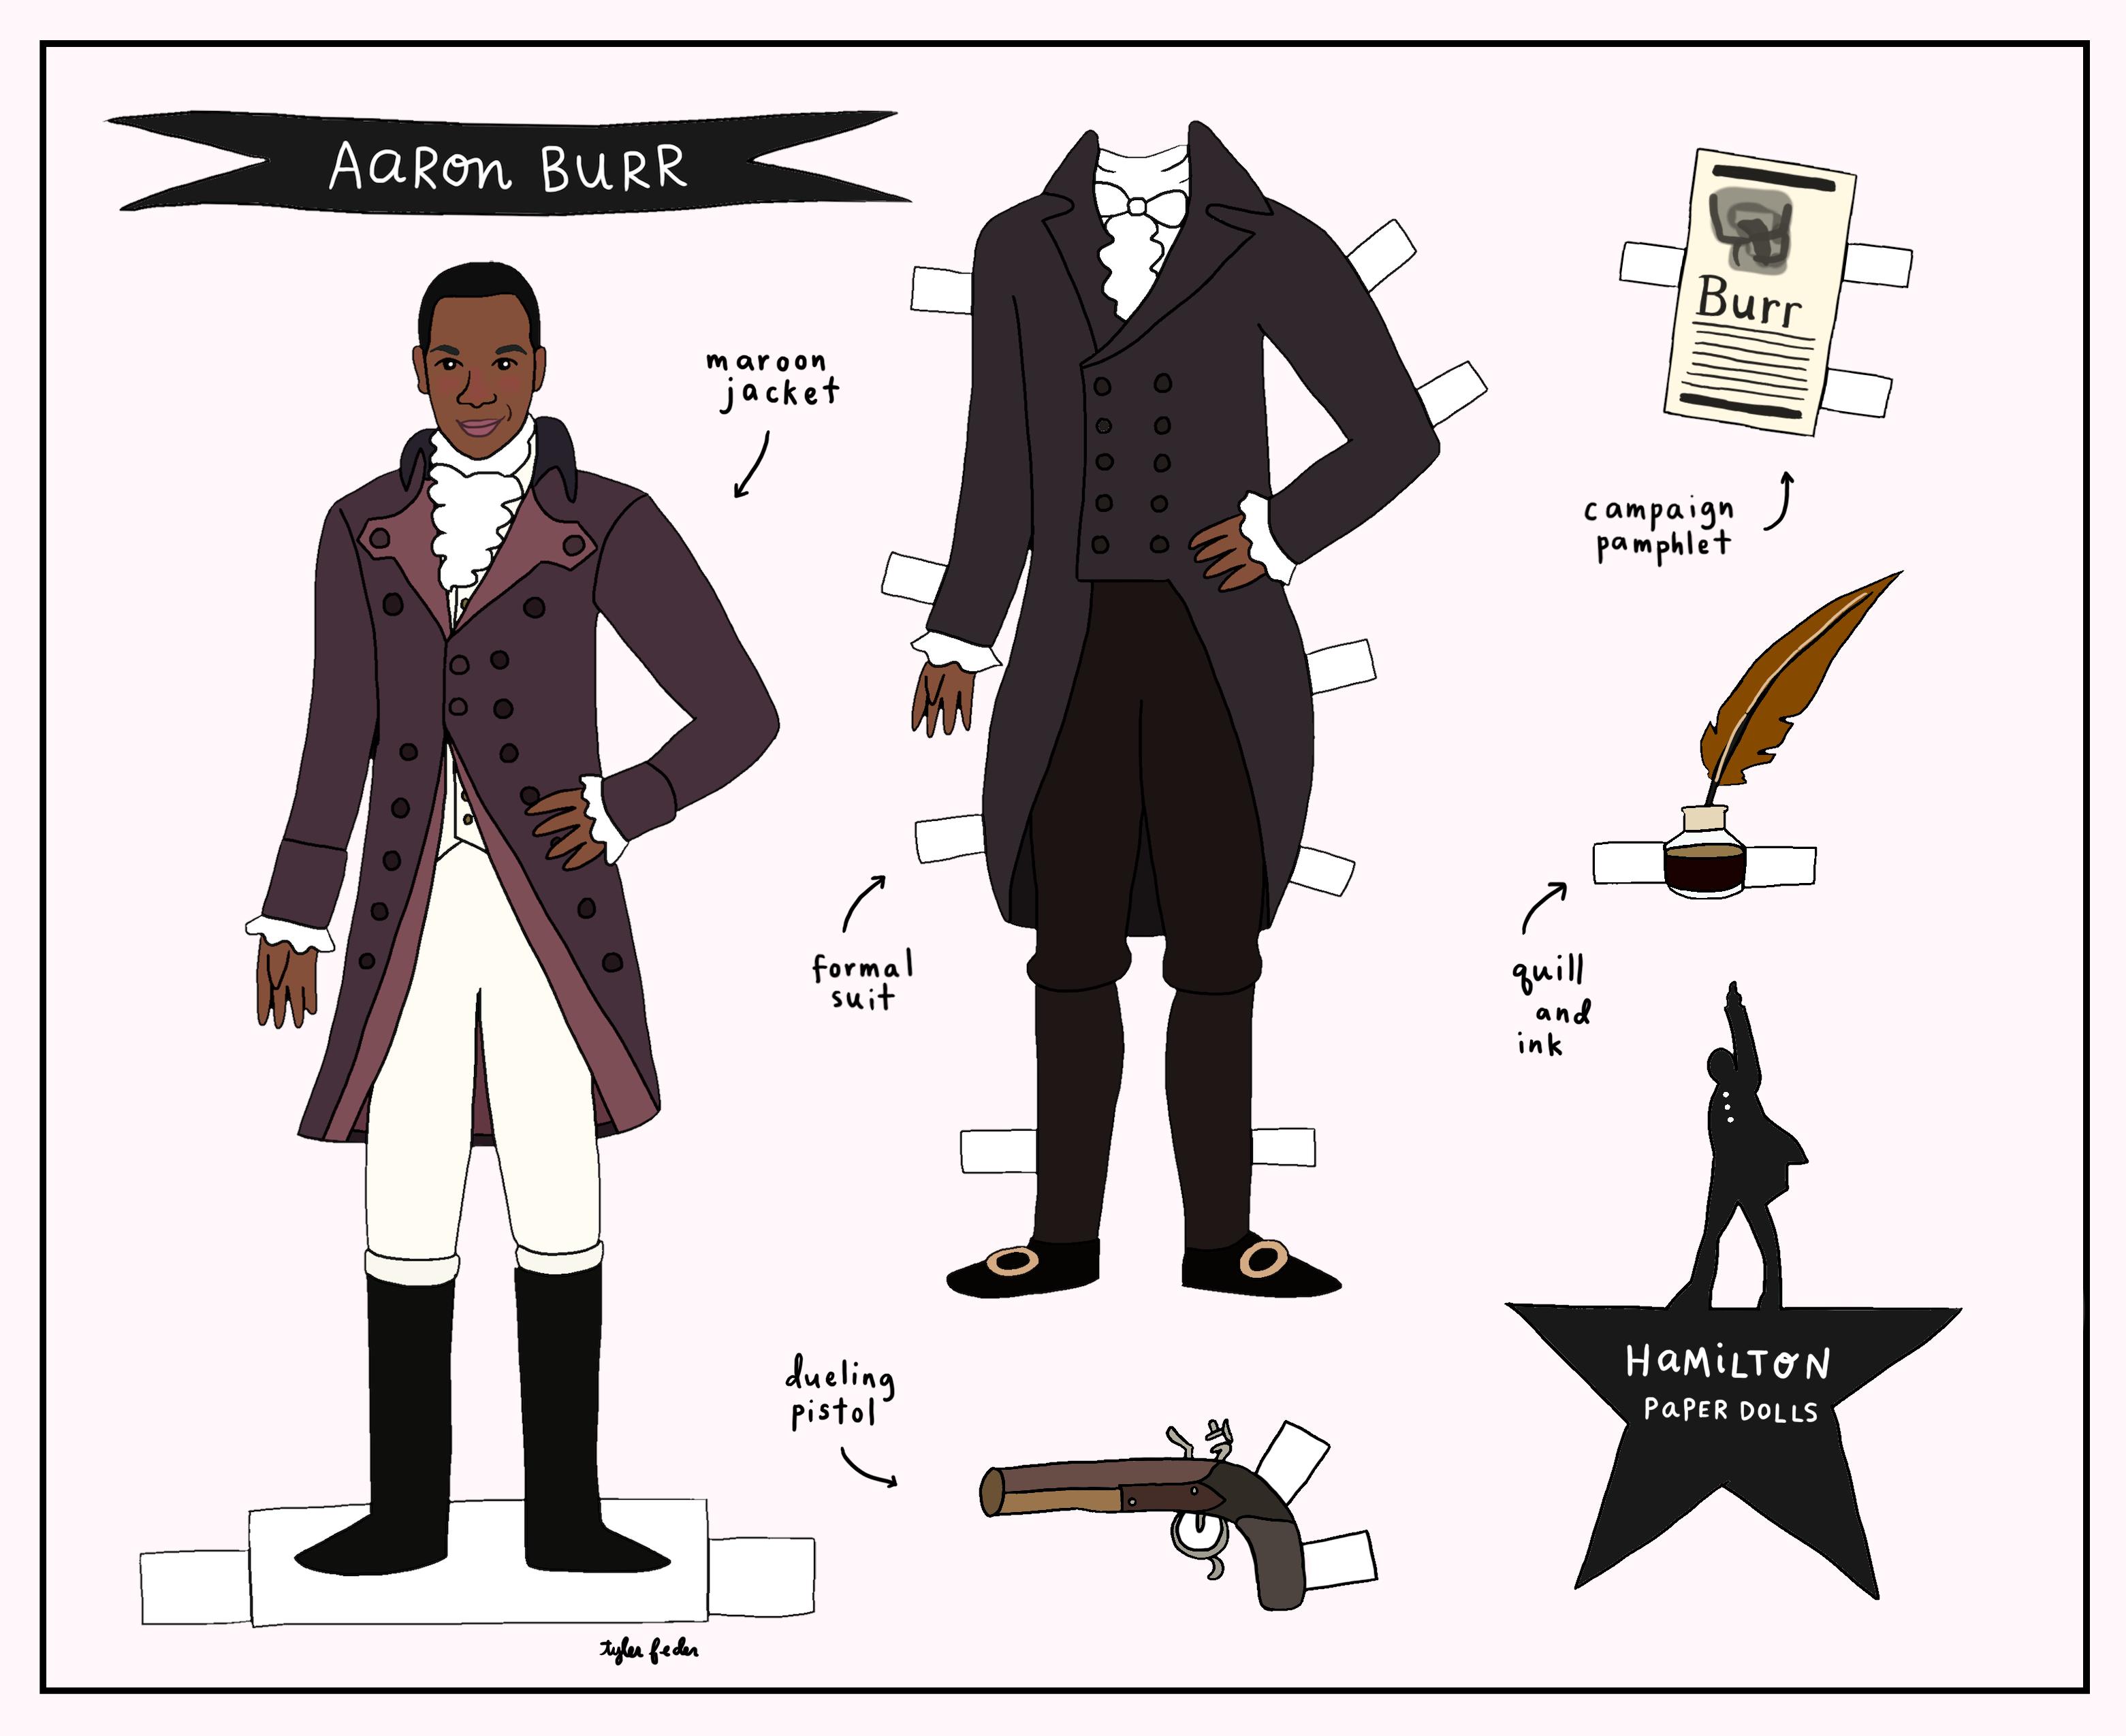 Alexander Hamilton vs. Aaron Burr